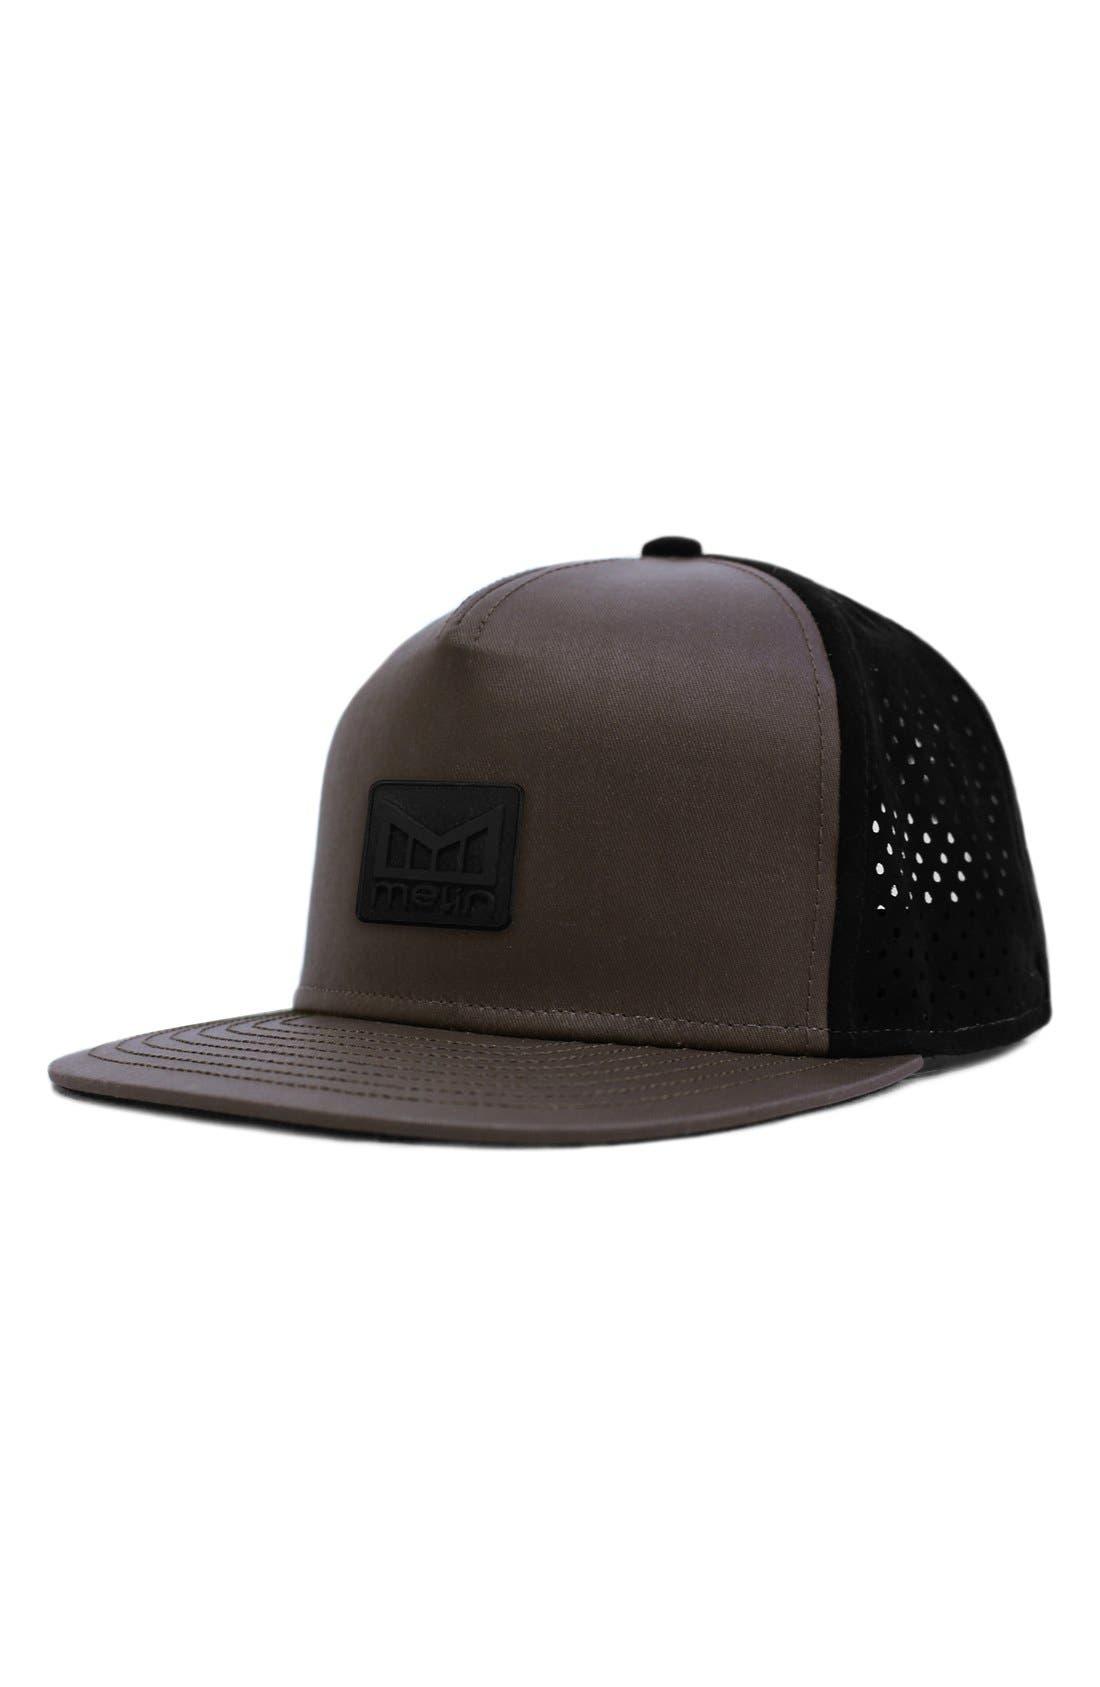 'The Nomad' Split Fit Snapback Baseball Cap,                             Main thumbnail 1, color,                             Taupe